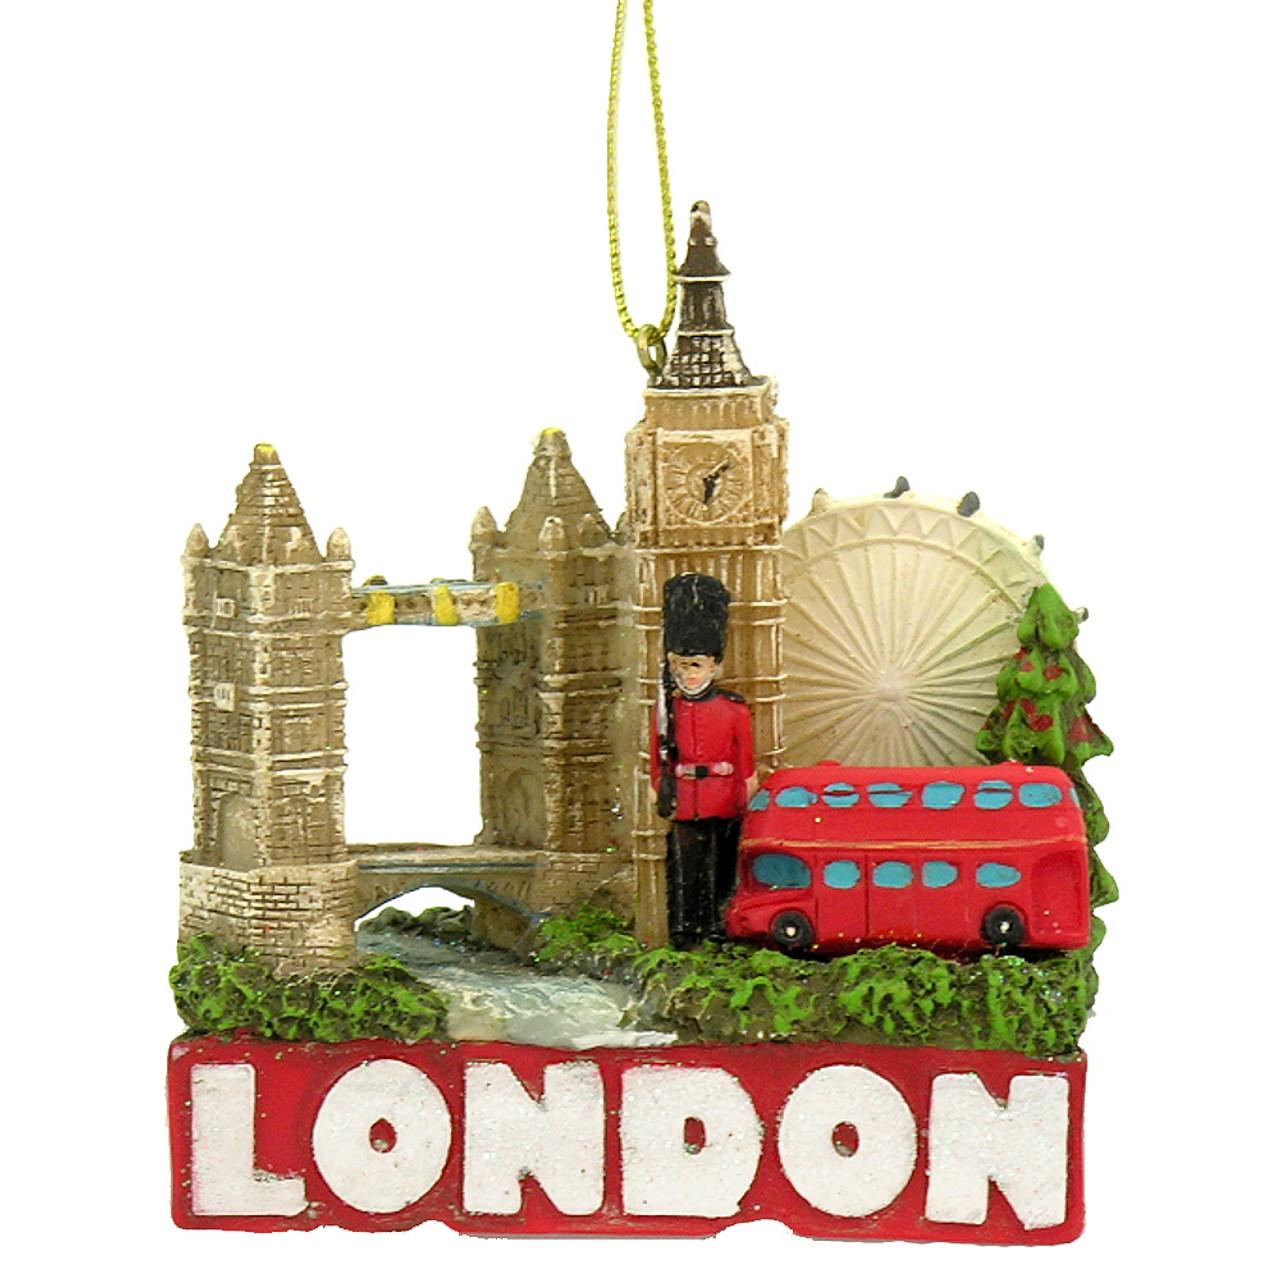 London Skyline and Landmarks Christmas Ornament